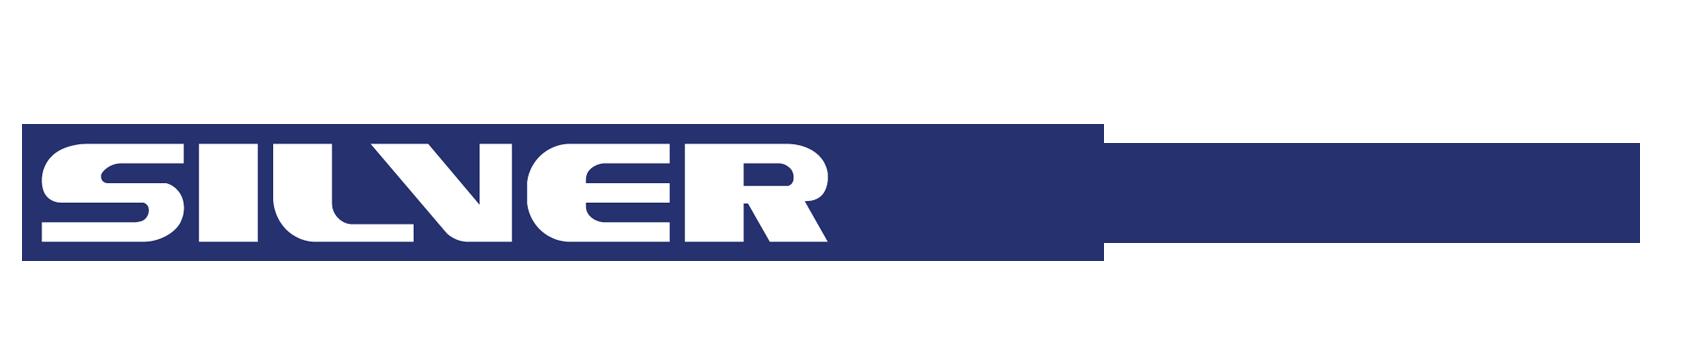 Silvercraft-logo